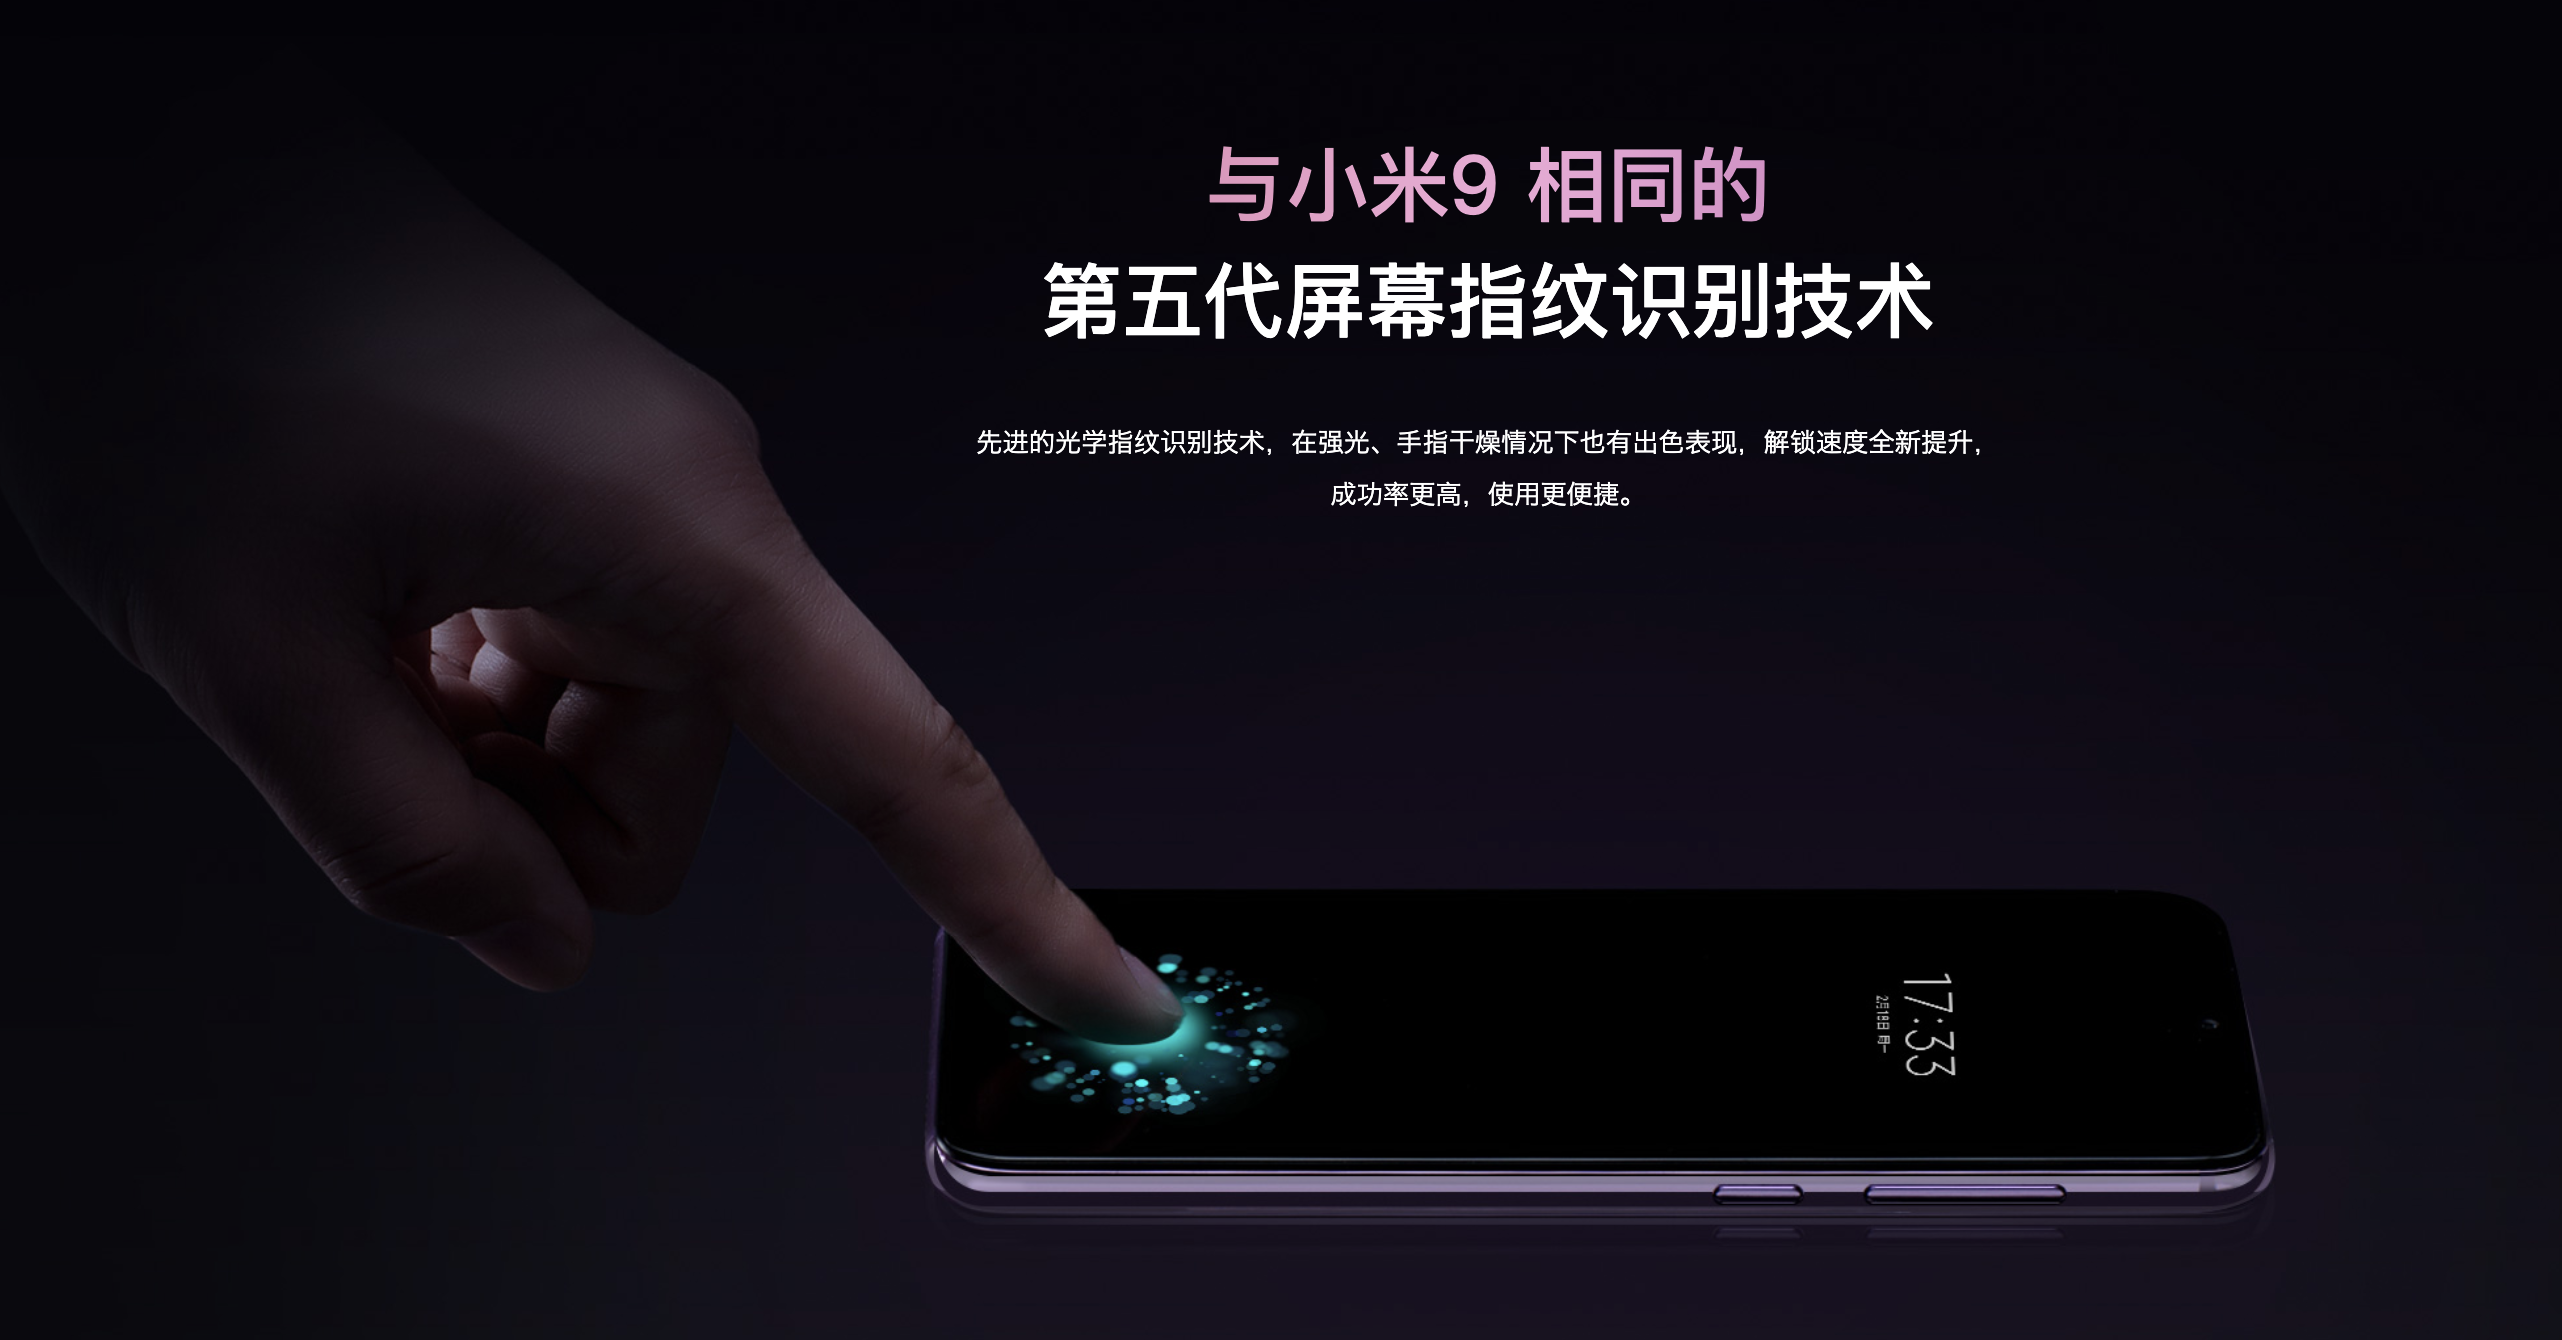 Xiaomi Mi 9 SEの生体認証